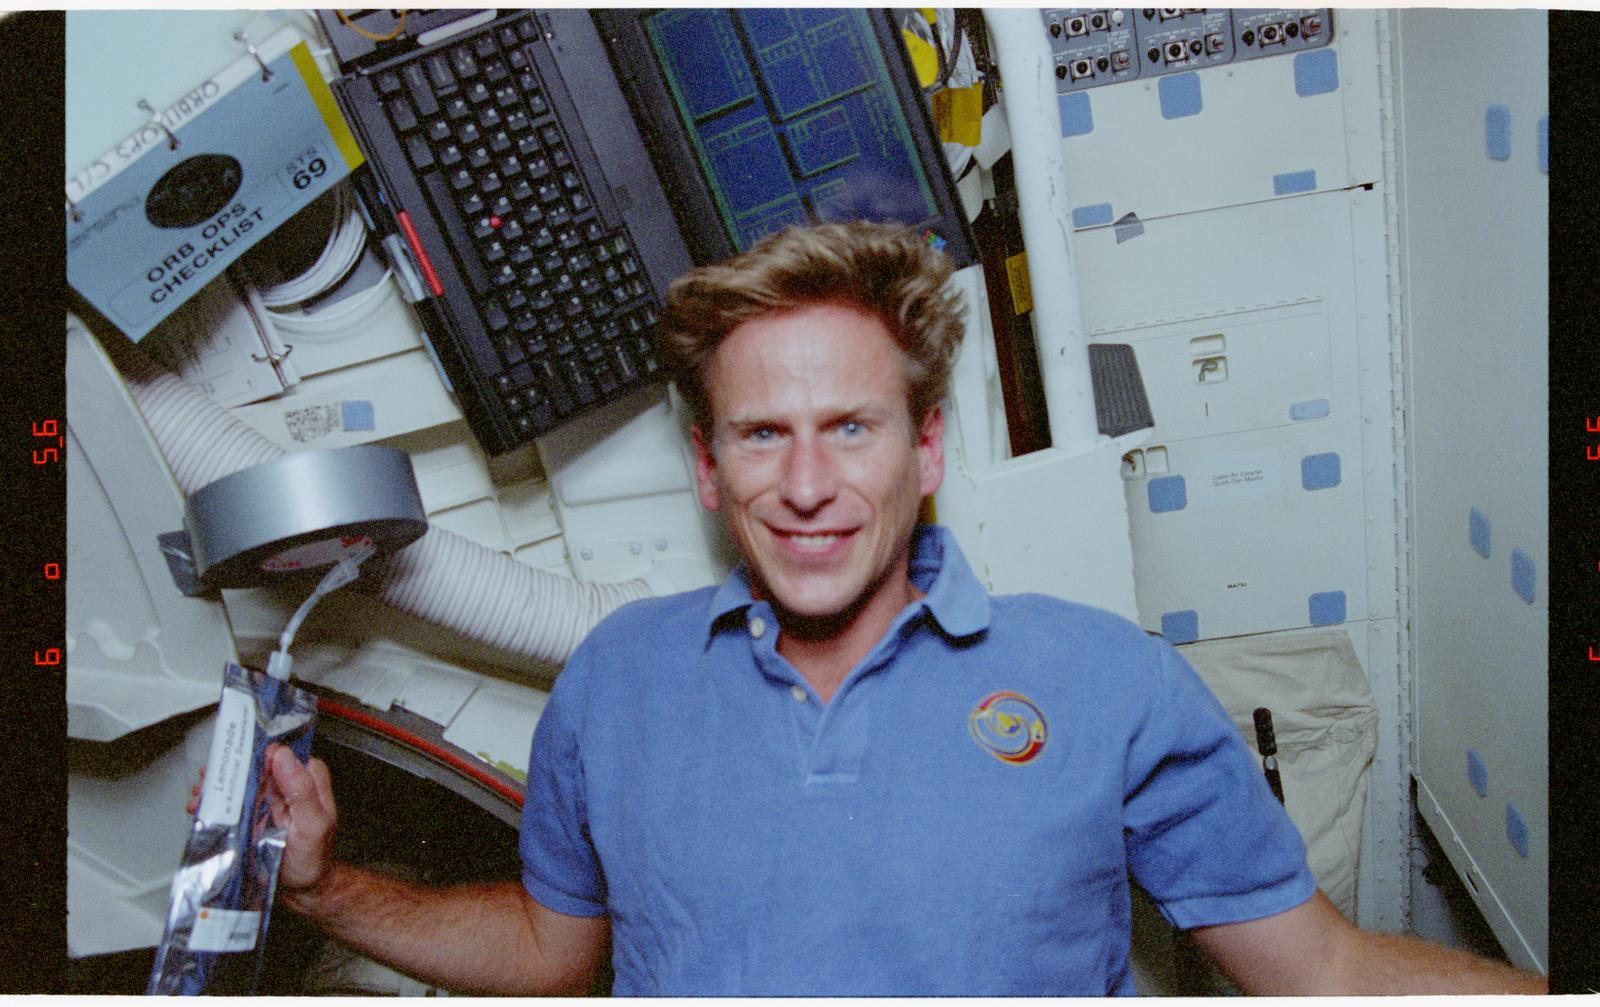 STS069-301-019 - STS-069 - Astronaut Gernhardt on middeck